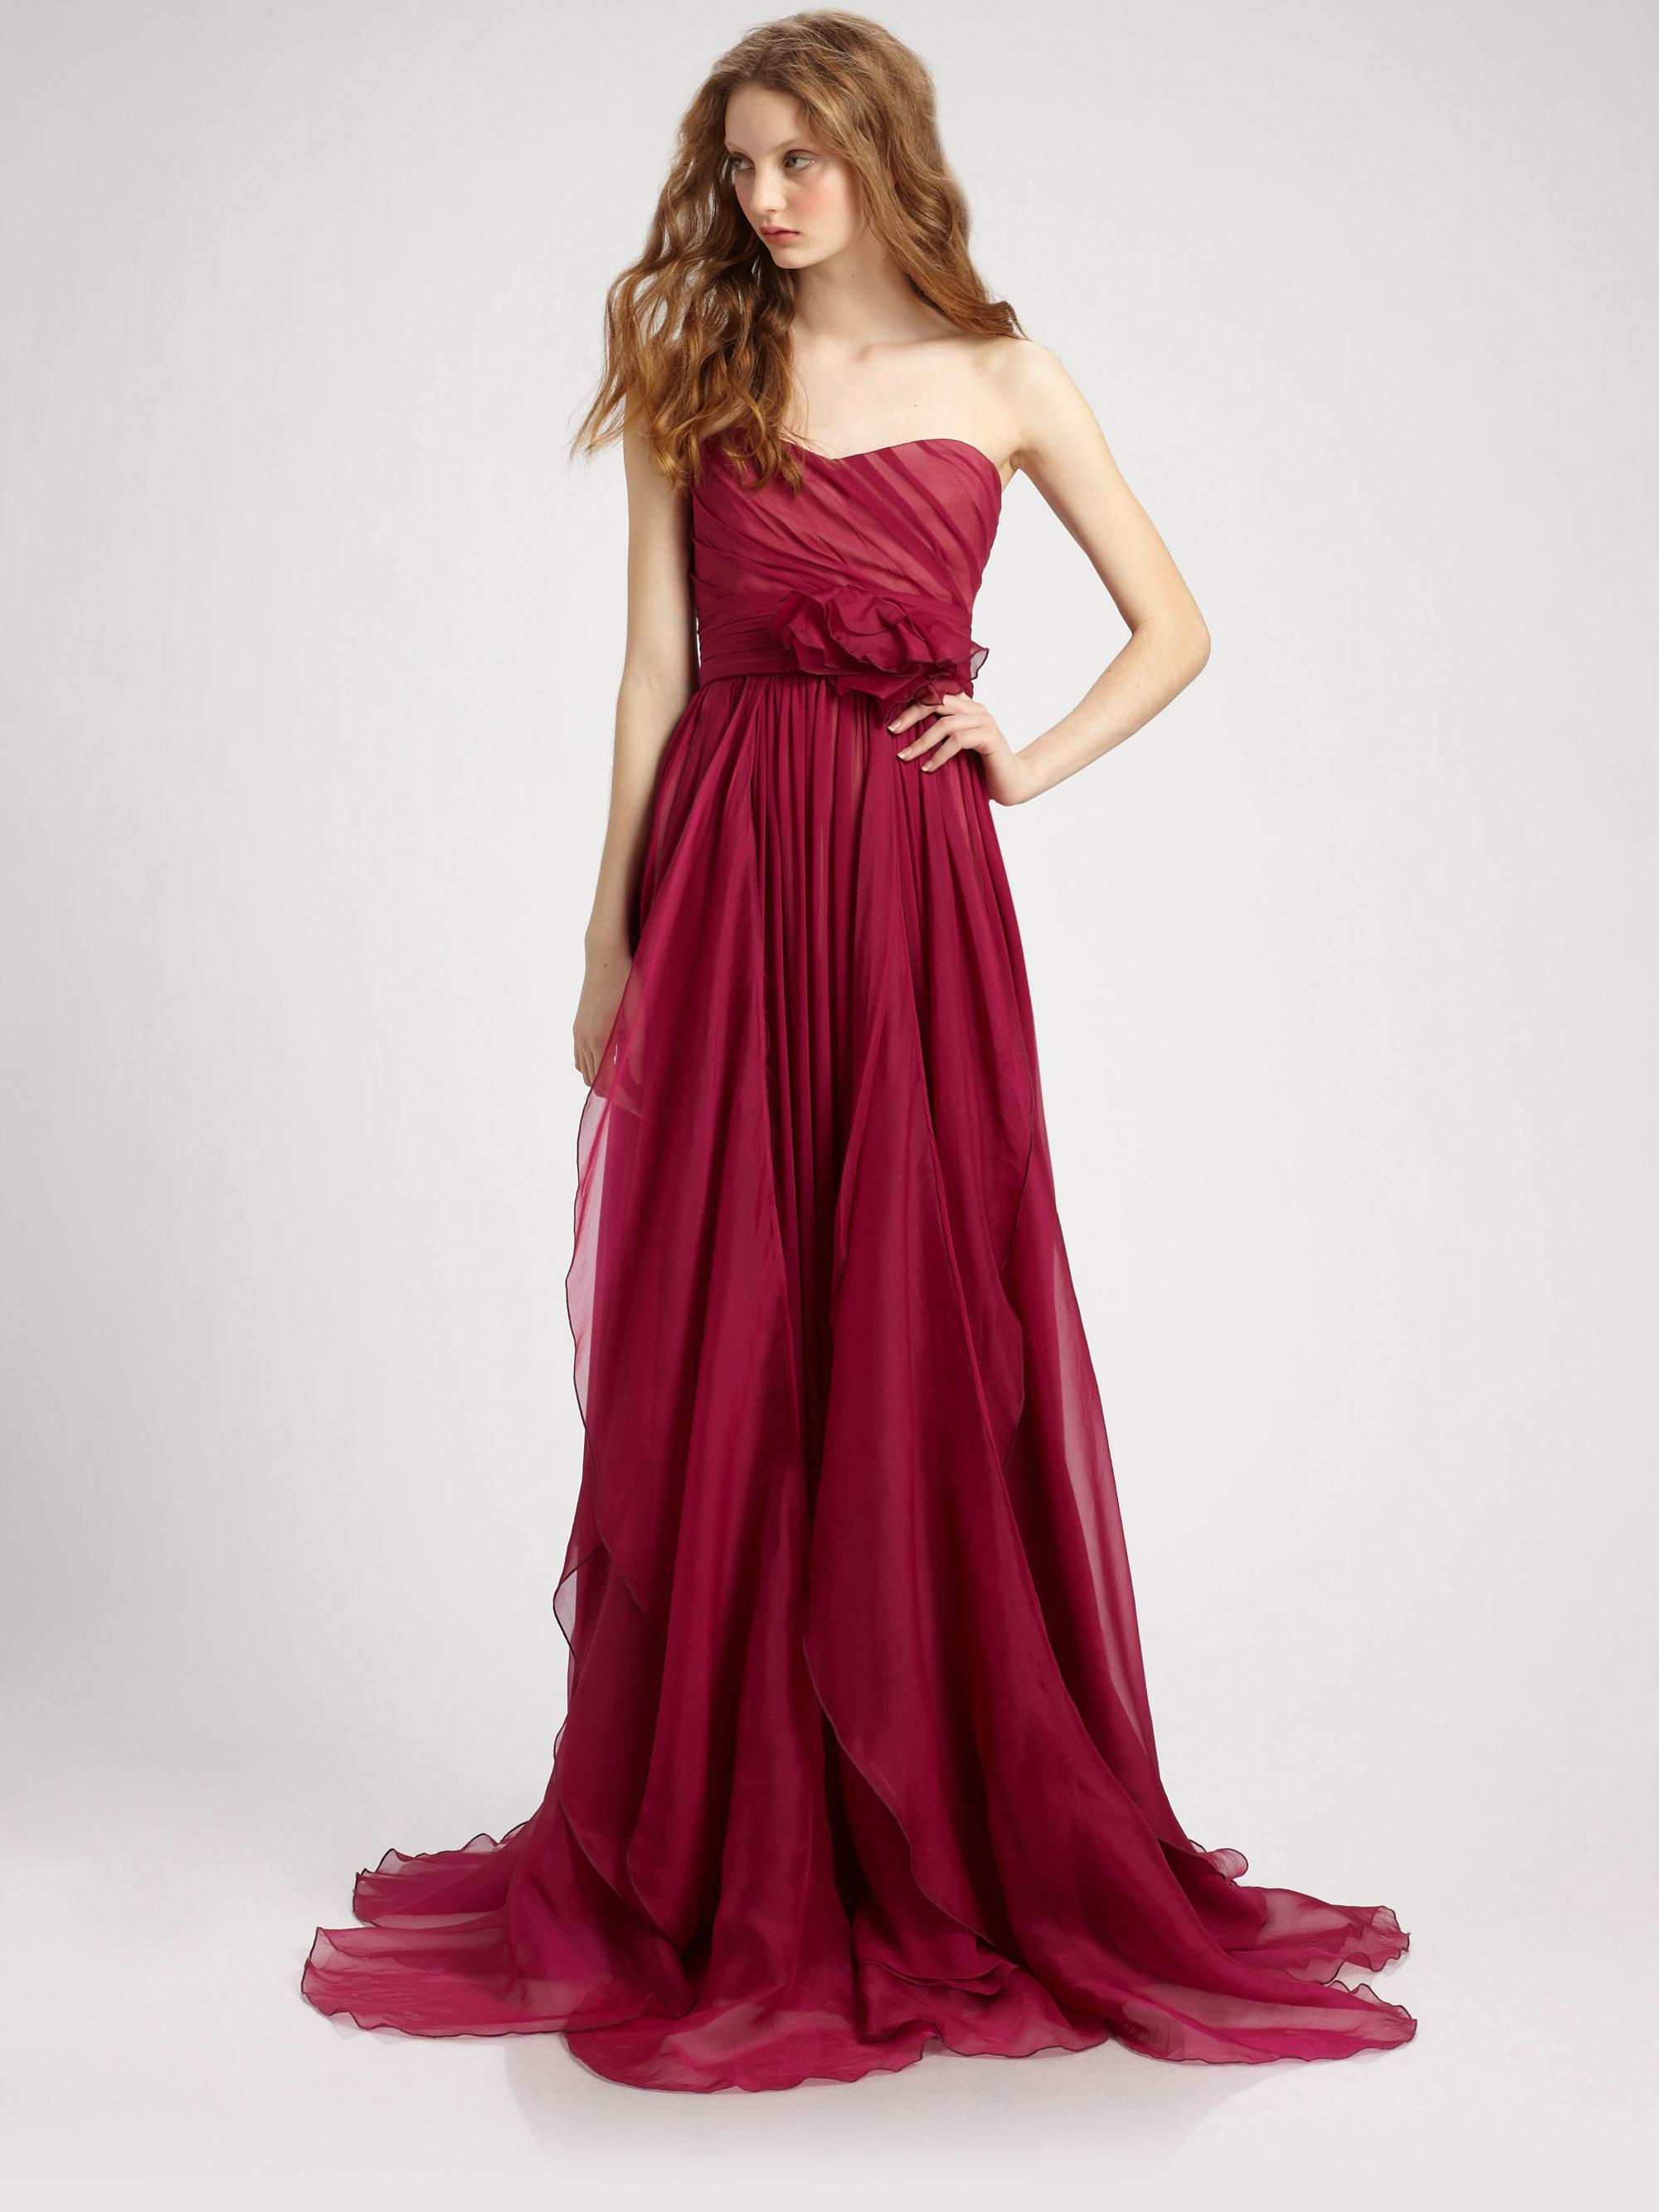 Notte by marchesa Silk Chiffon Strapless Empire Waist Gown in Red ...